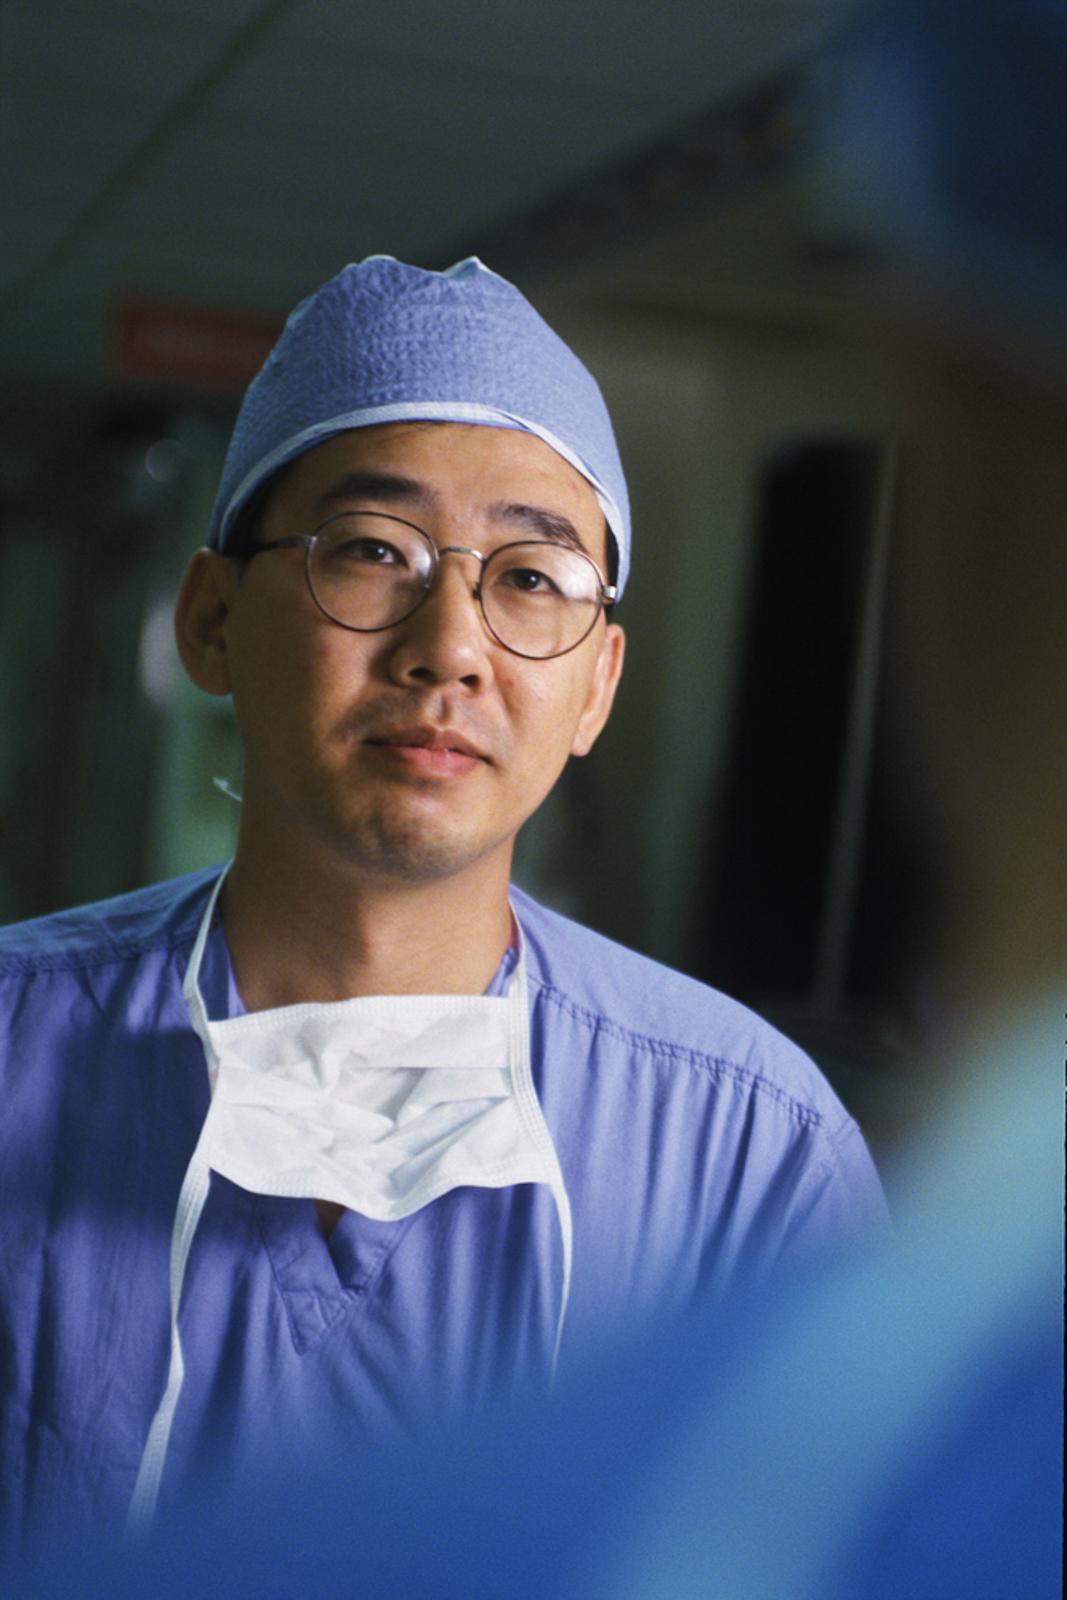 Portrait of health professional wearing glasses